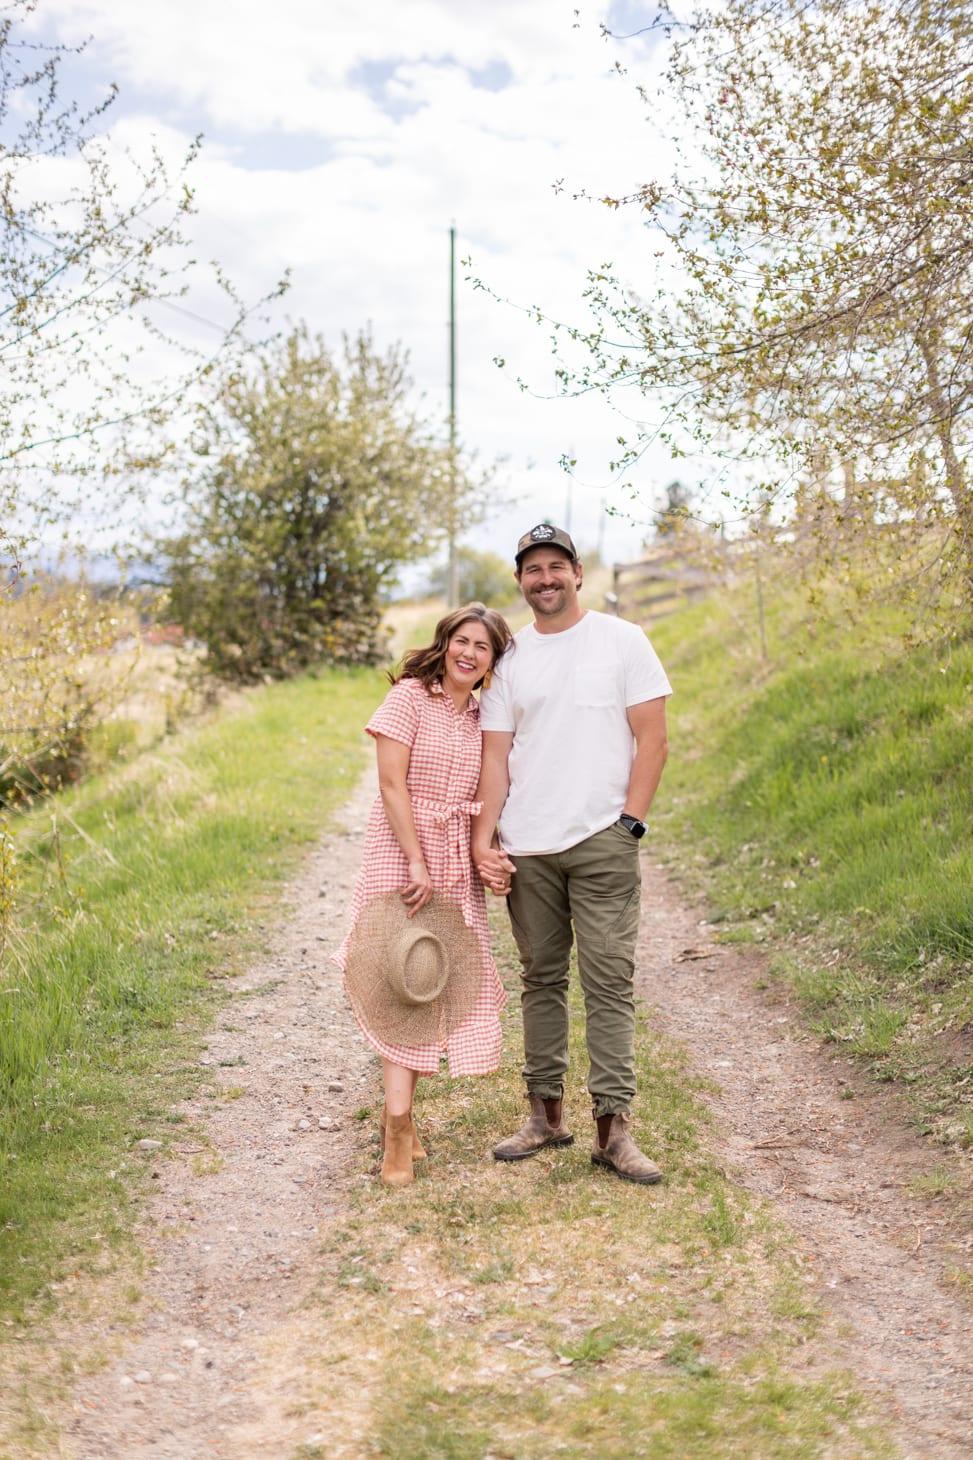 Jillian Harris and Justin Pasutto's New Property